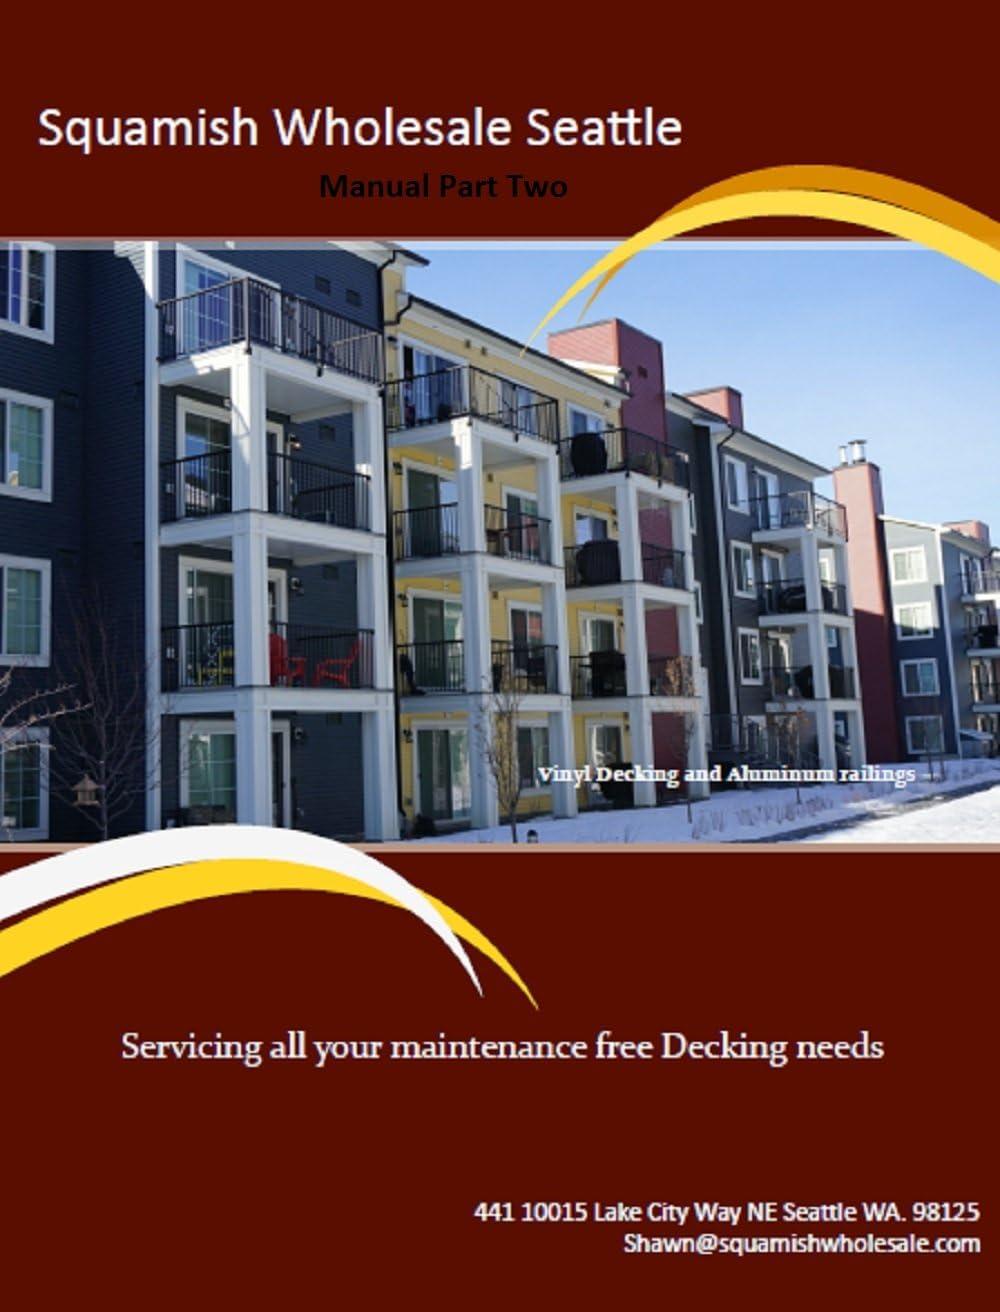 DIY Home Improvement/ Commercial, Deck, Porch, Veranda and Roof Top Terrace, Outdoor Vinyl Decking/Flooring/Membrane Kit (Vinyl Manual, Part Two)